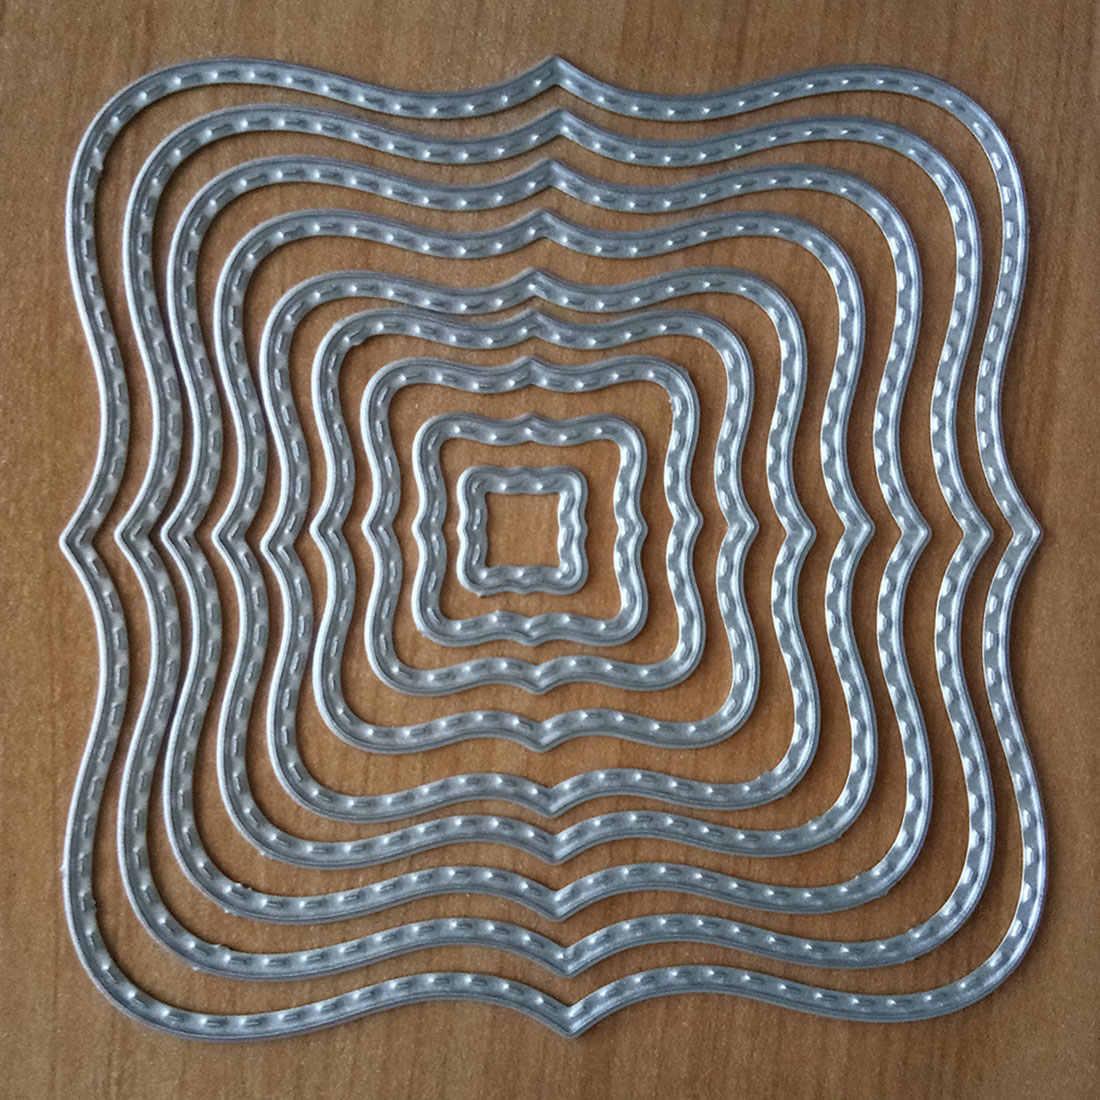 Carbon Steel Cutting Die Stencil DIY Embossed Frame Template Square Wave 9pcs DE